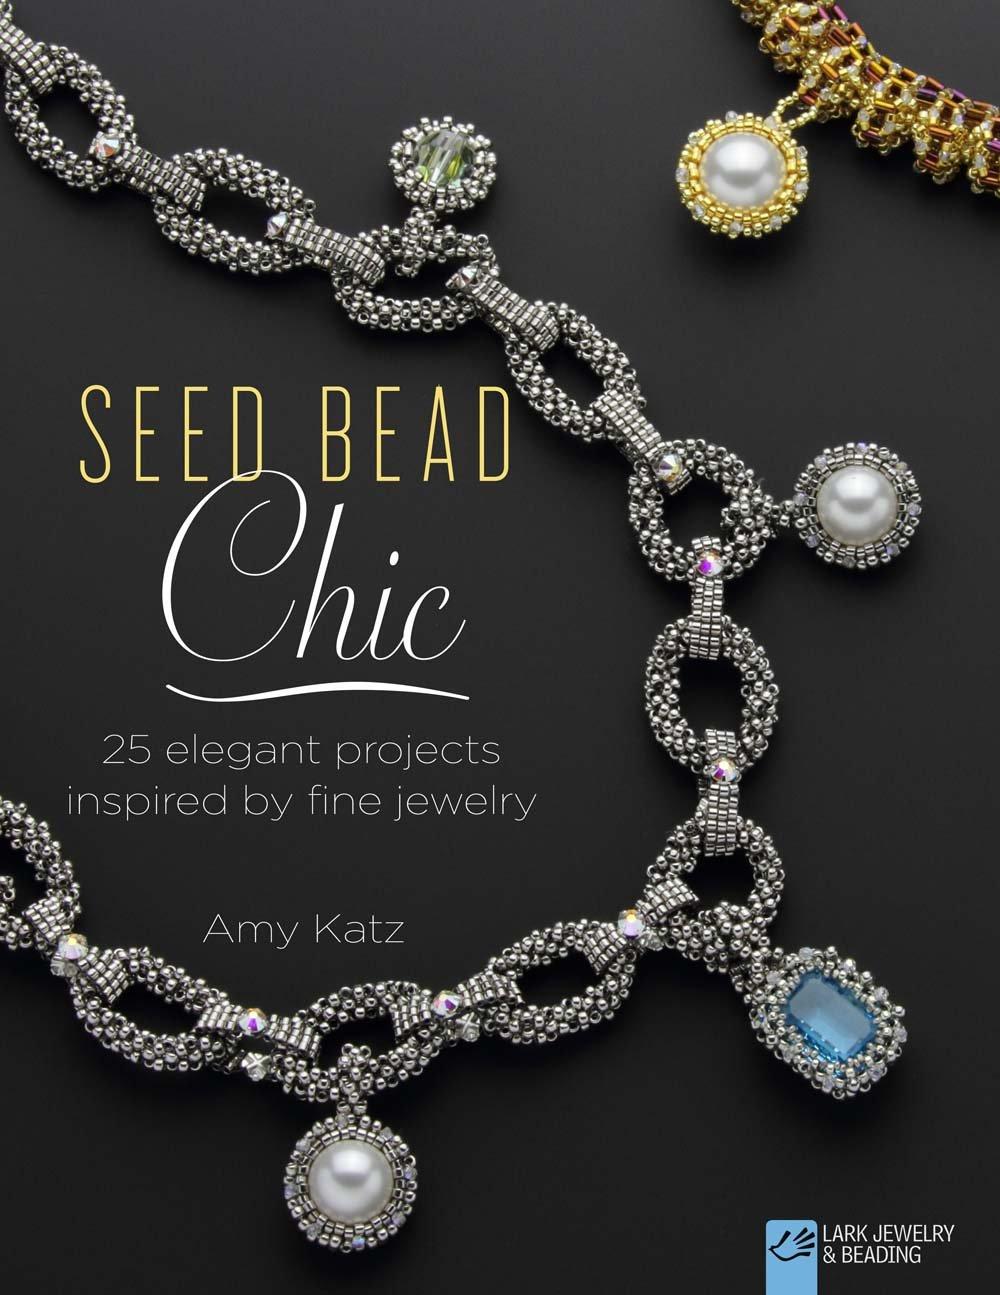 Seed Bead Chic (Lark Jewelry & Beading Bead Inspirations)